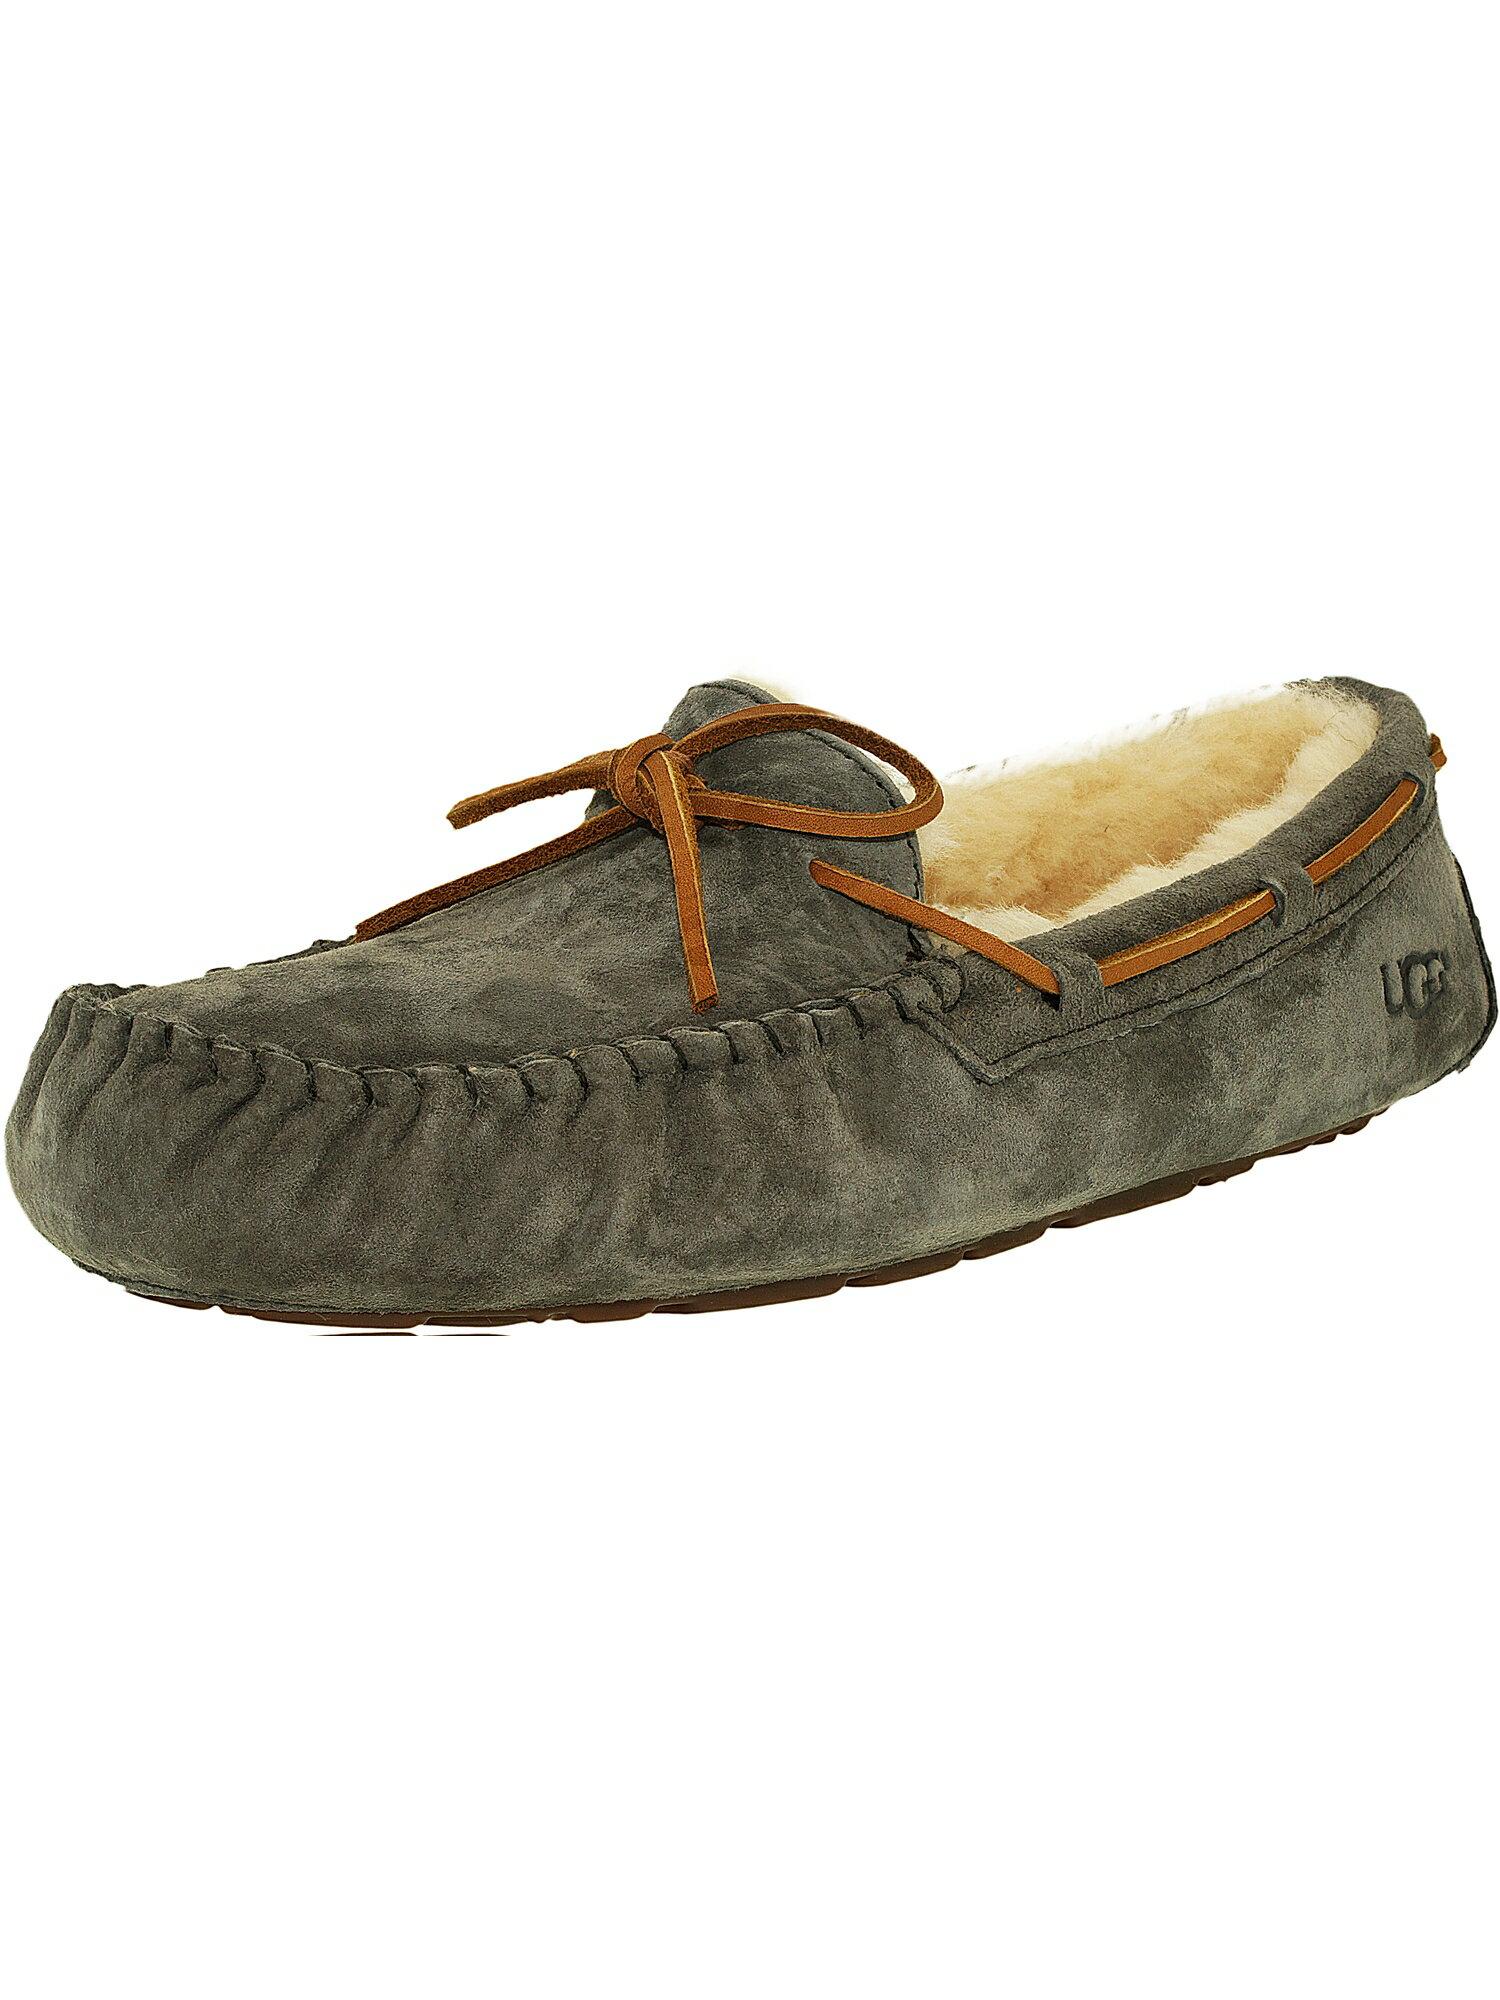 f81e2eca51 Ugg Women's Dakota Leather Black Ankle-High Suede Slipper